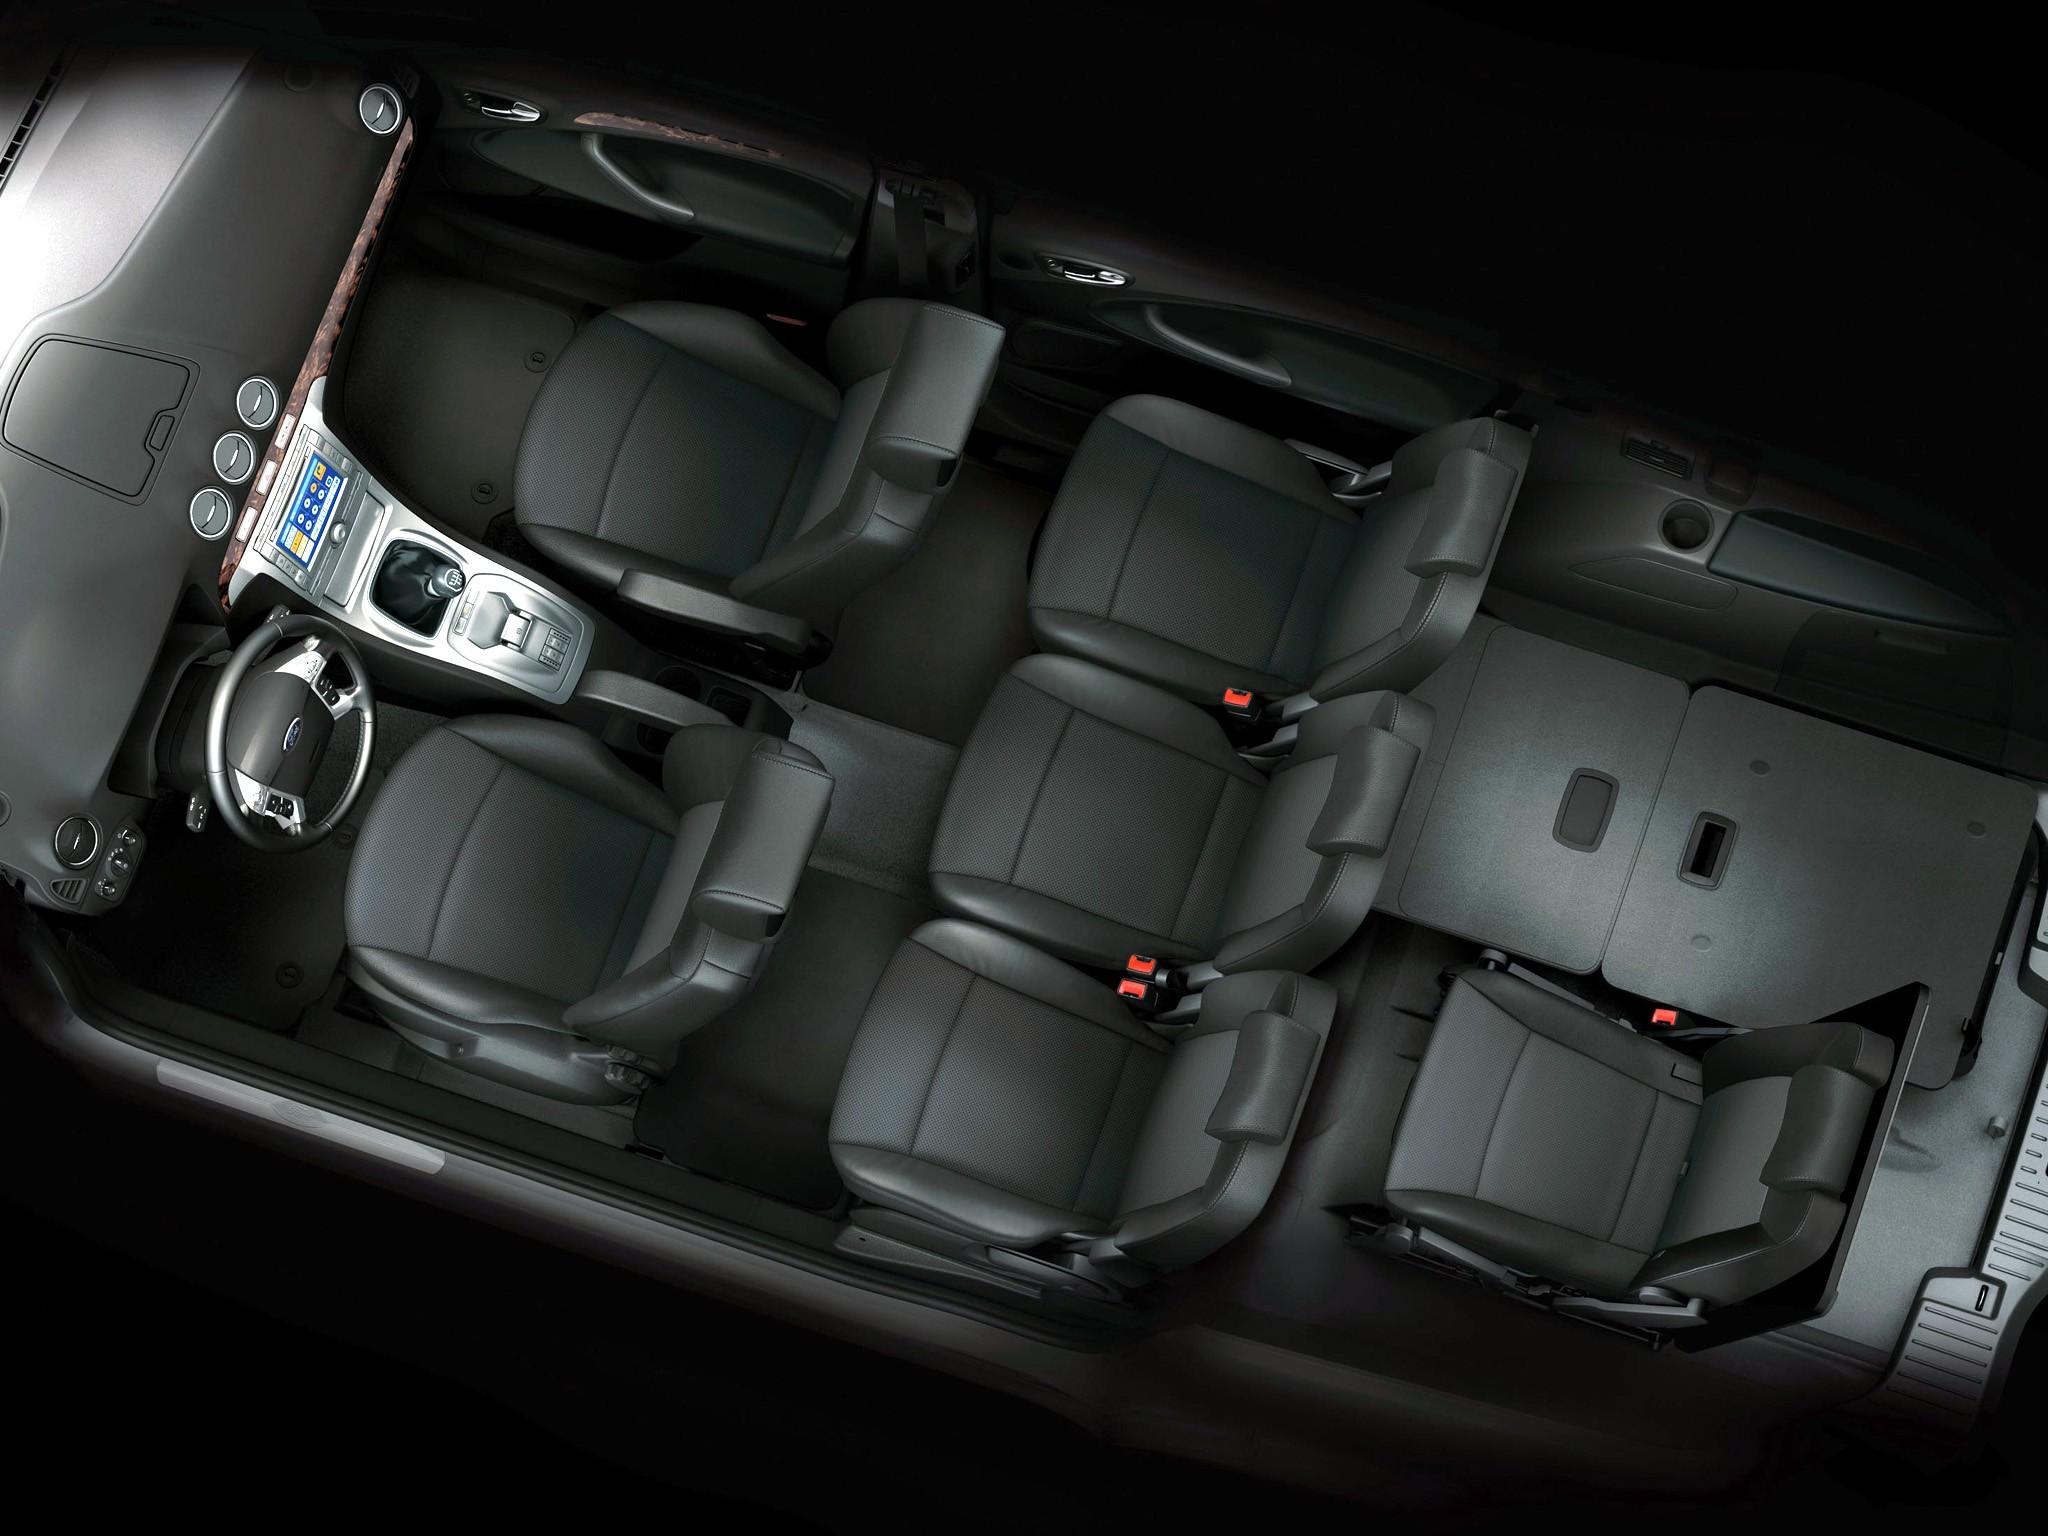 FORD Galaxy - 2006, 2007, 2008, 2009, 2010, 2011, 2012, 2013, 2014, 2015, 2016 - autoevolution